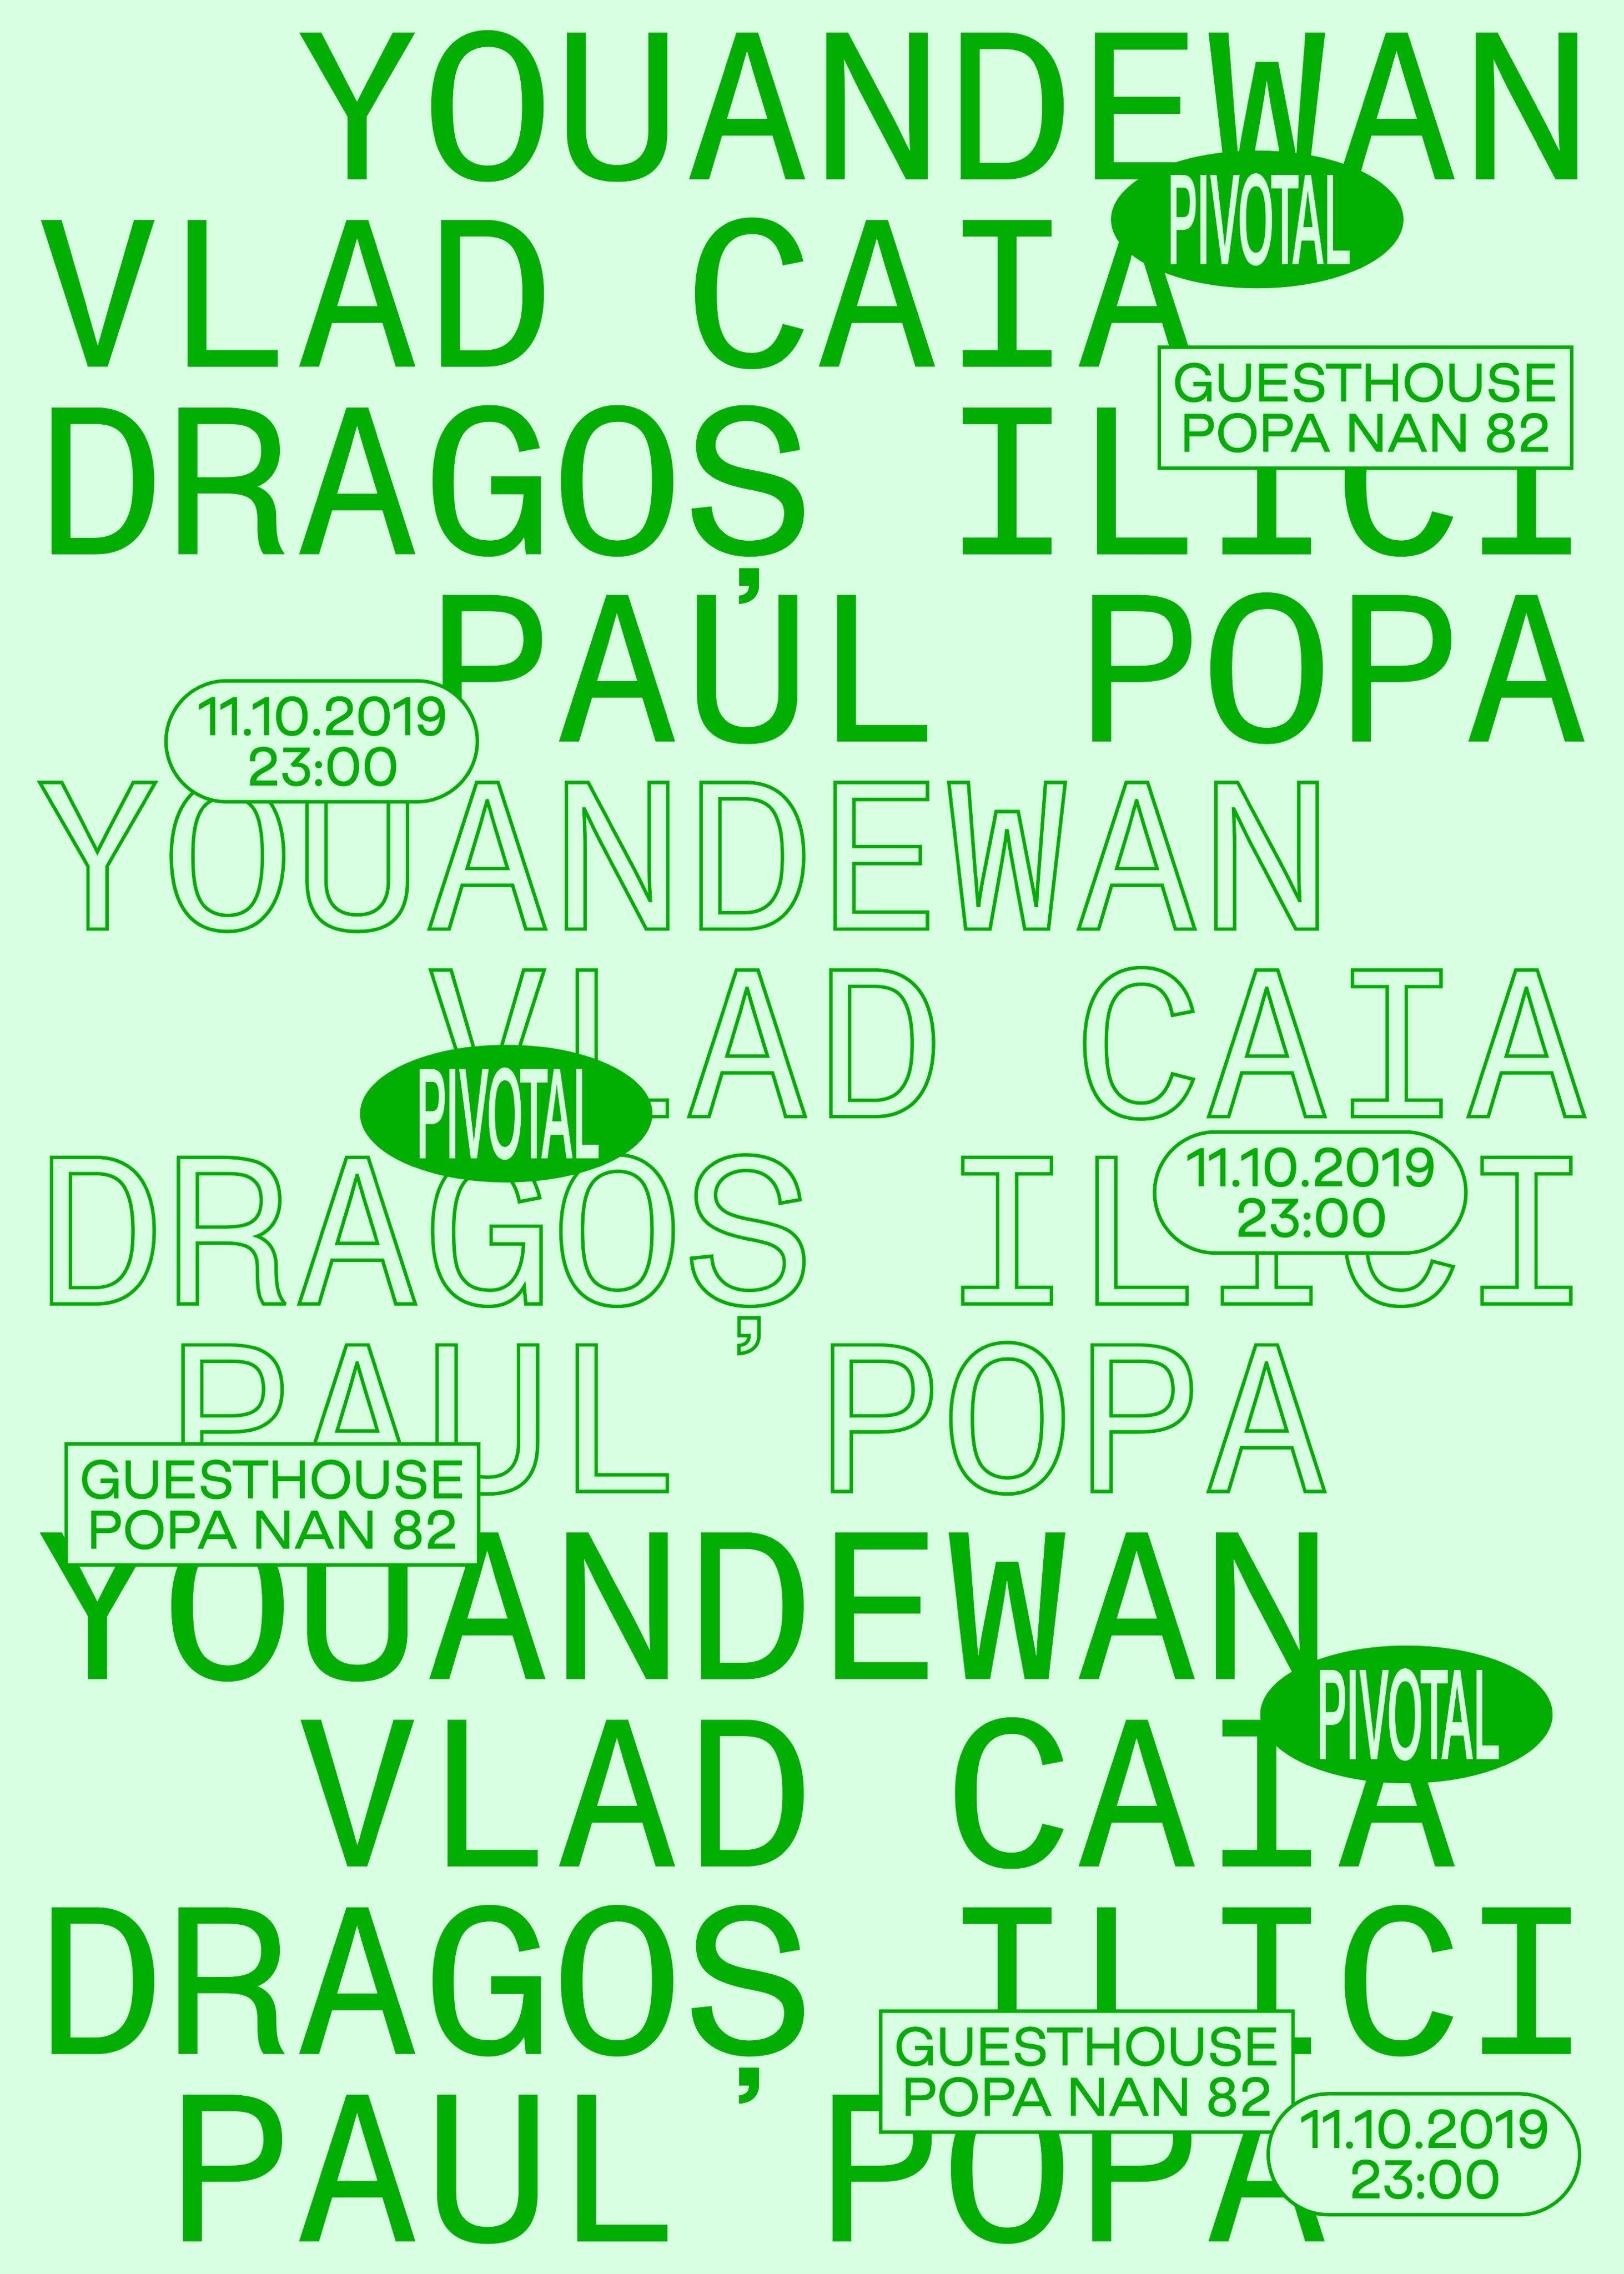 Pivotal w/ Youandewan, Vlad Caia, Dragoș Ilici, Paul Popa @ Guesthouse